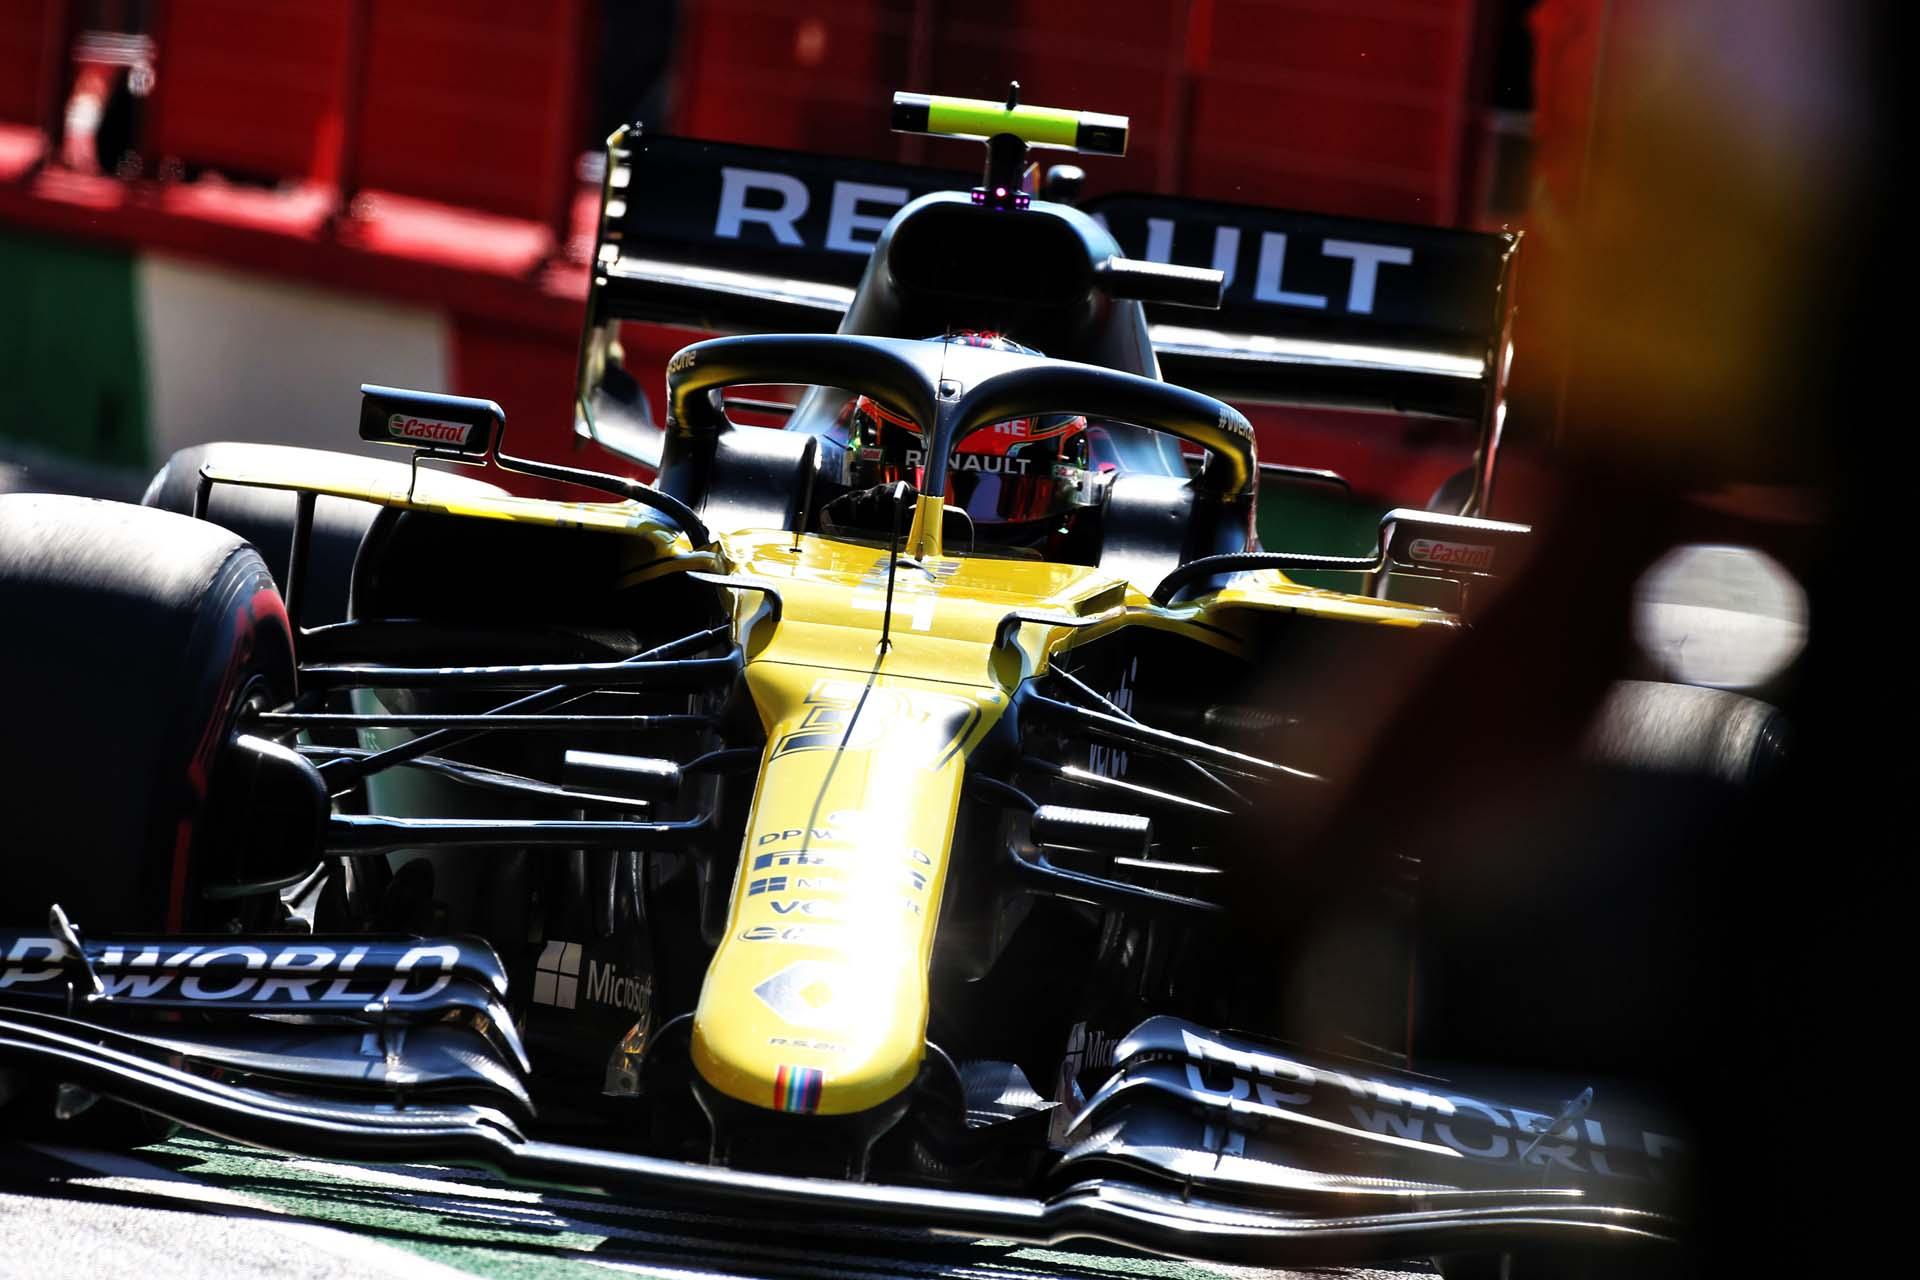 Motor Racing - Formula One World Championship - Tuscan Grand Prix - Qualifying Day - Mugello, Italy